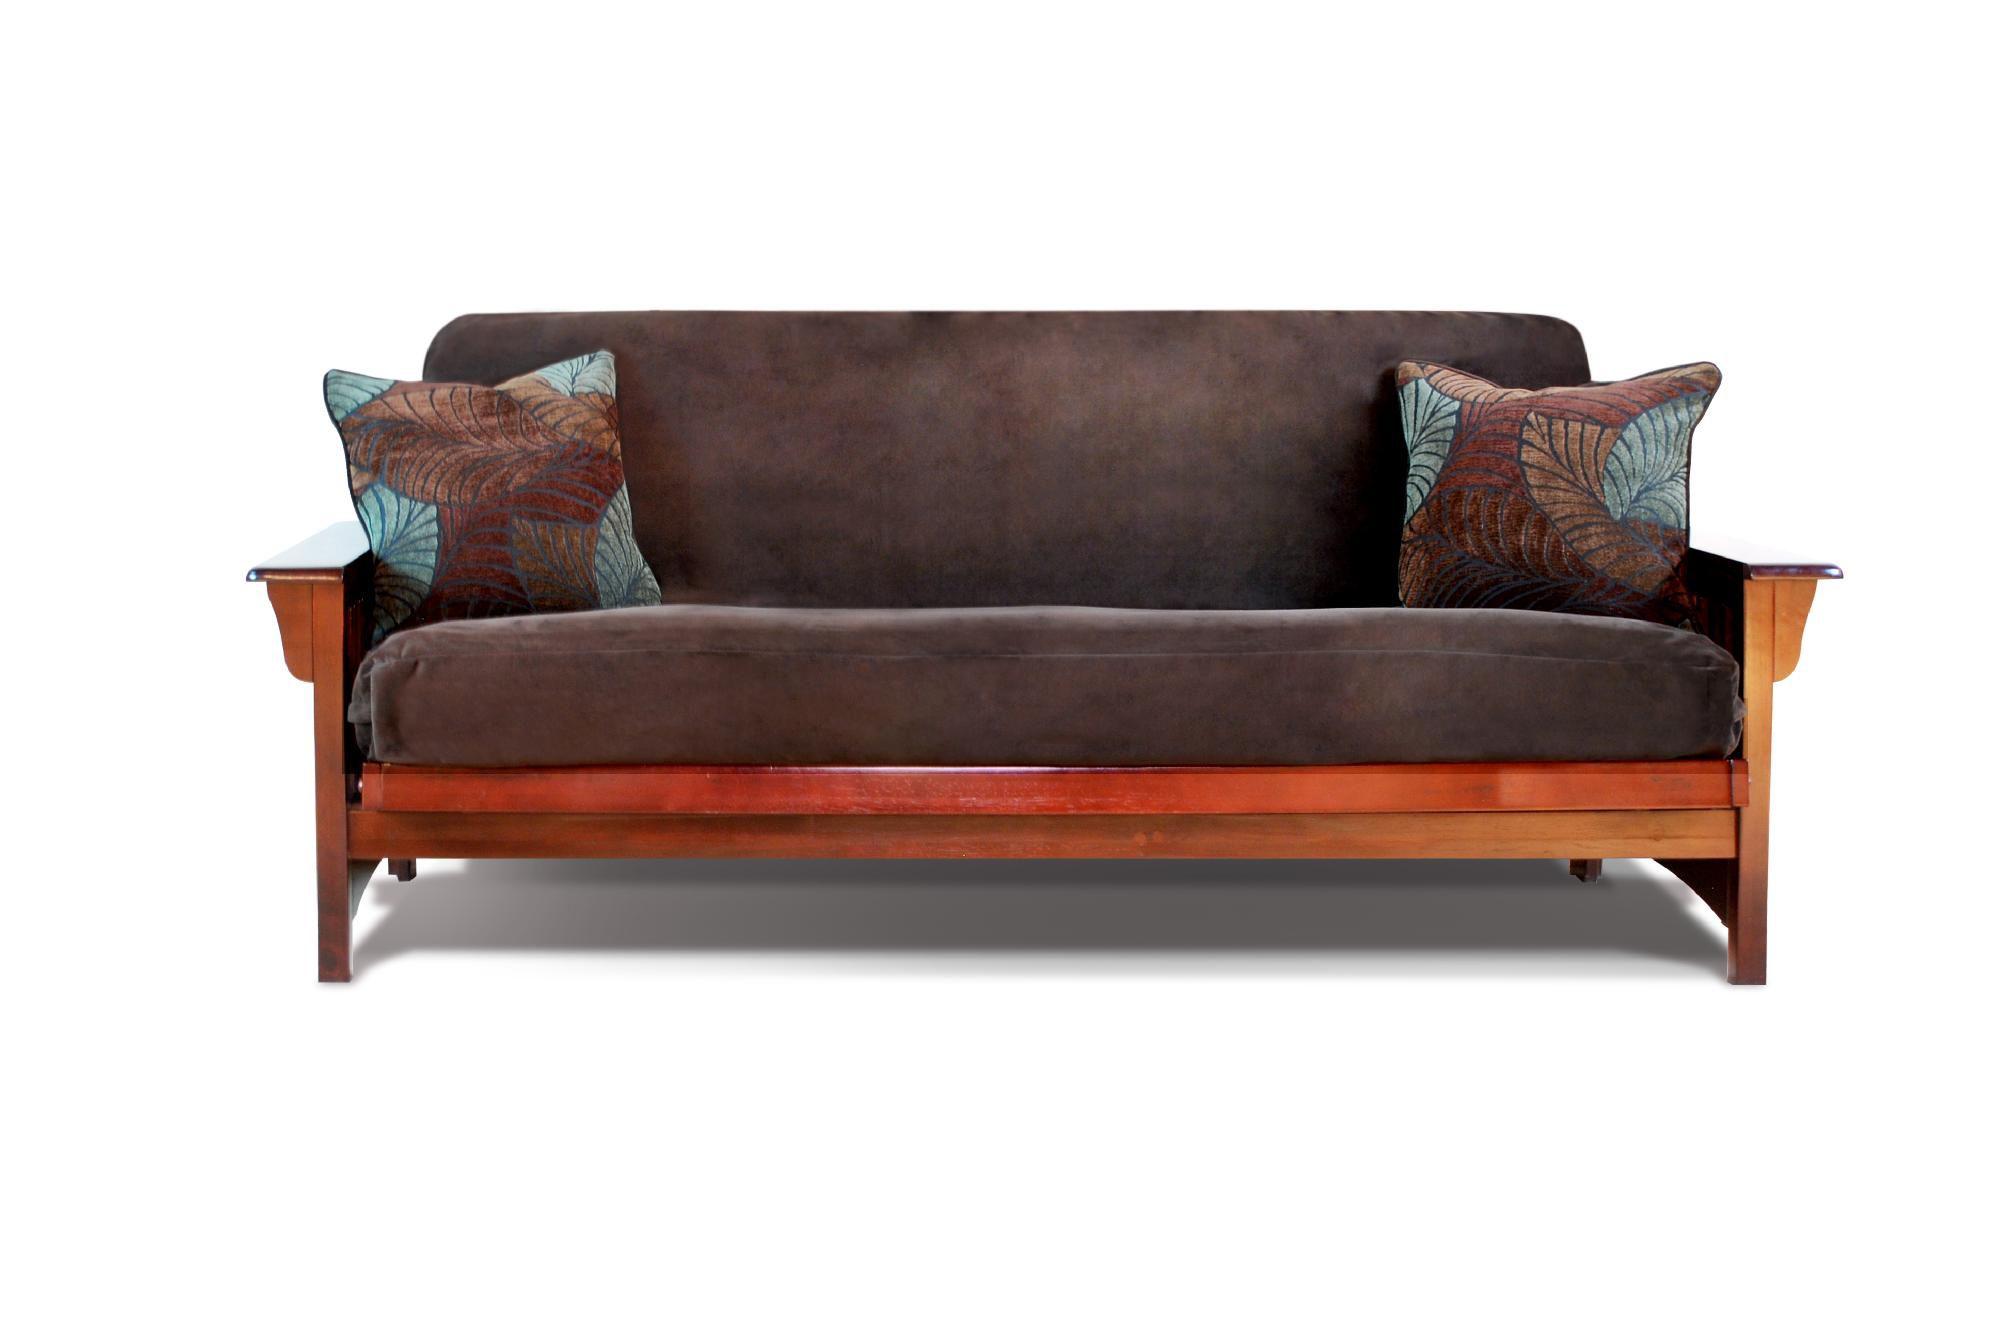 sears full size sleeper sofa empire antique american furniture alliance rekindle jade futon